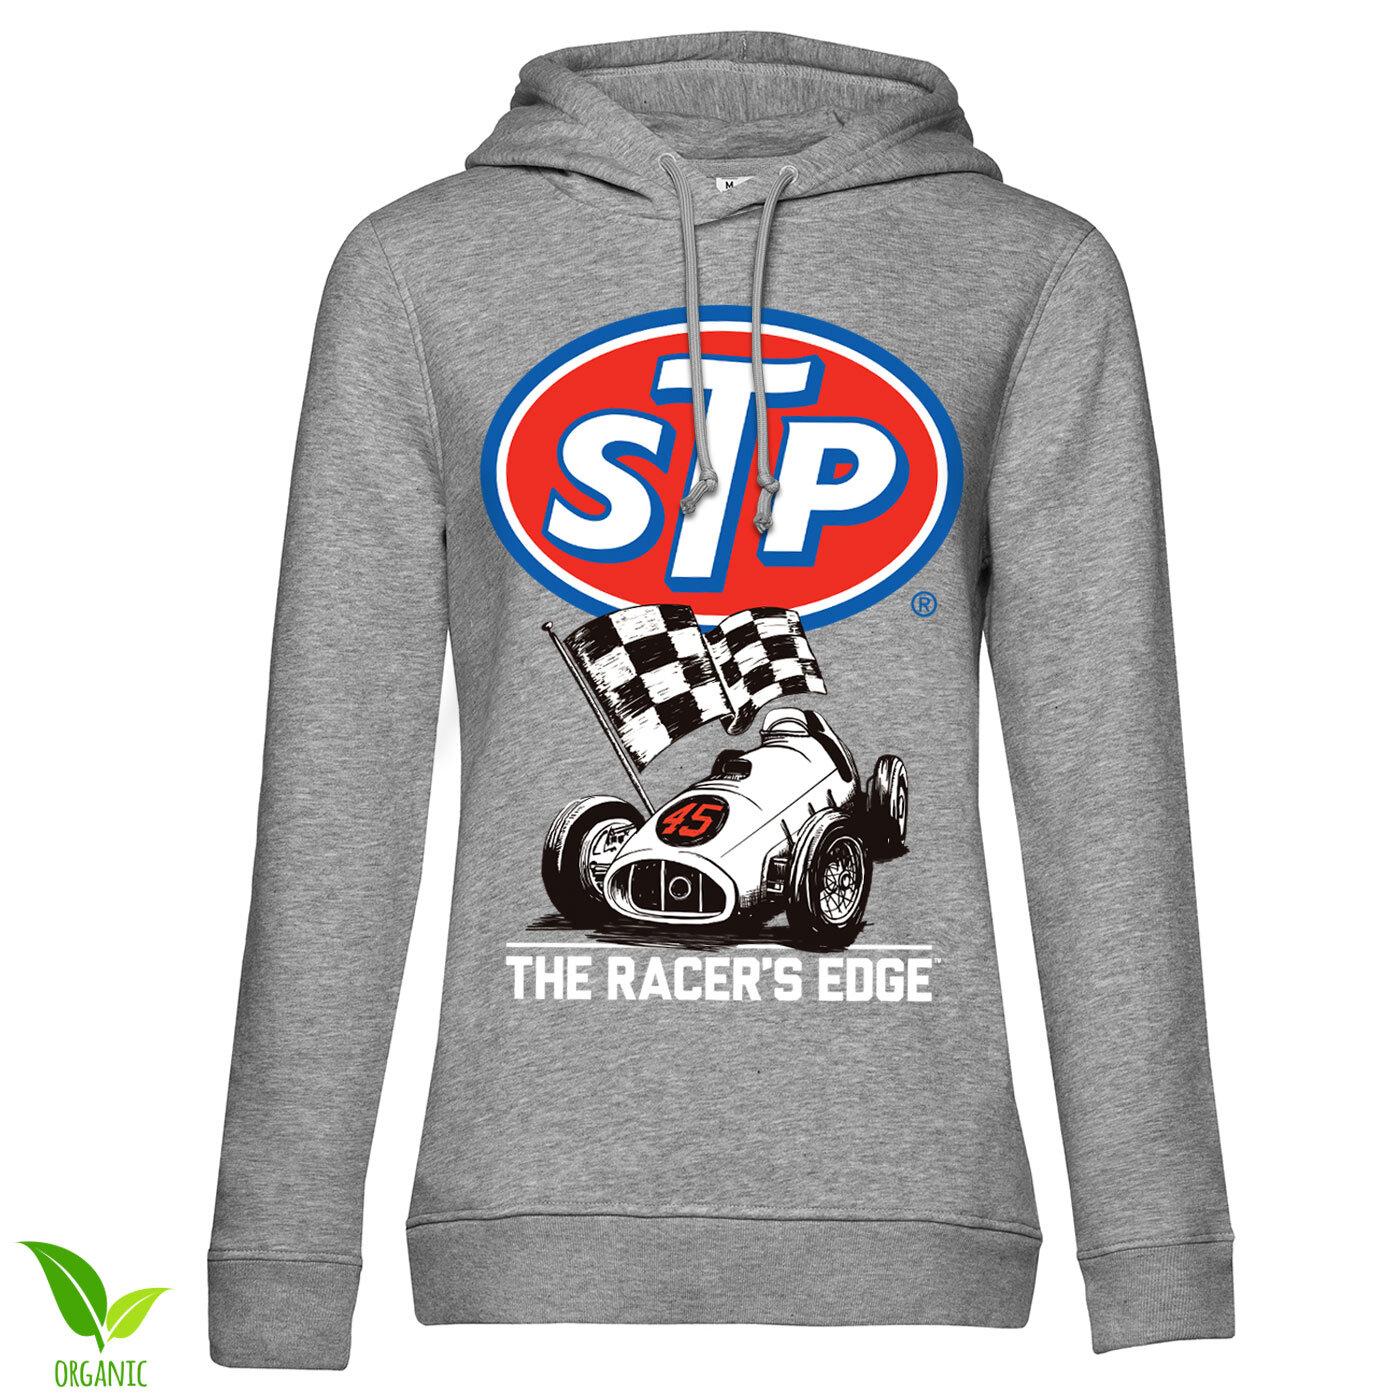 STP Retro Racer Girls Hoodie